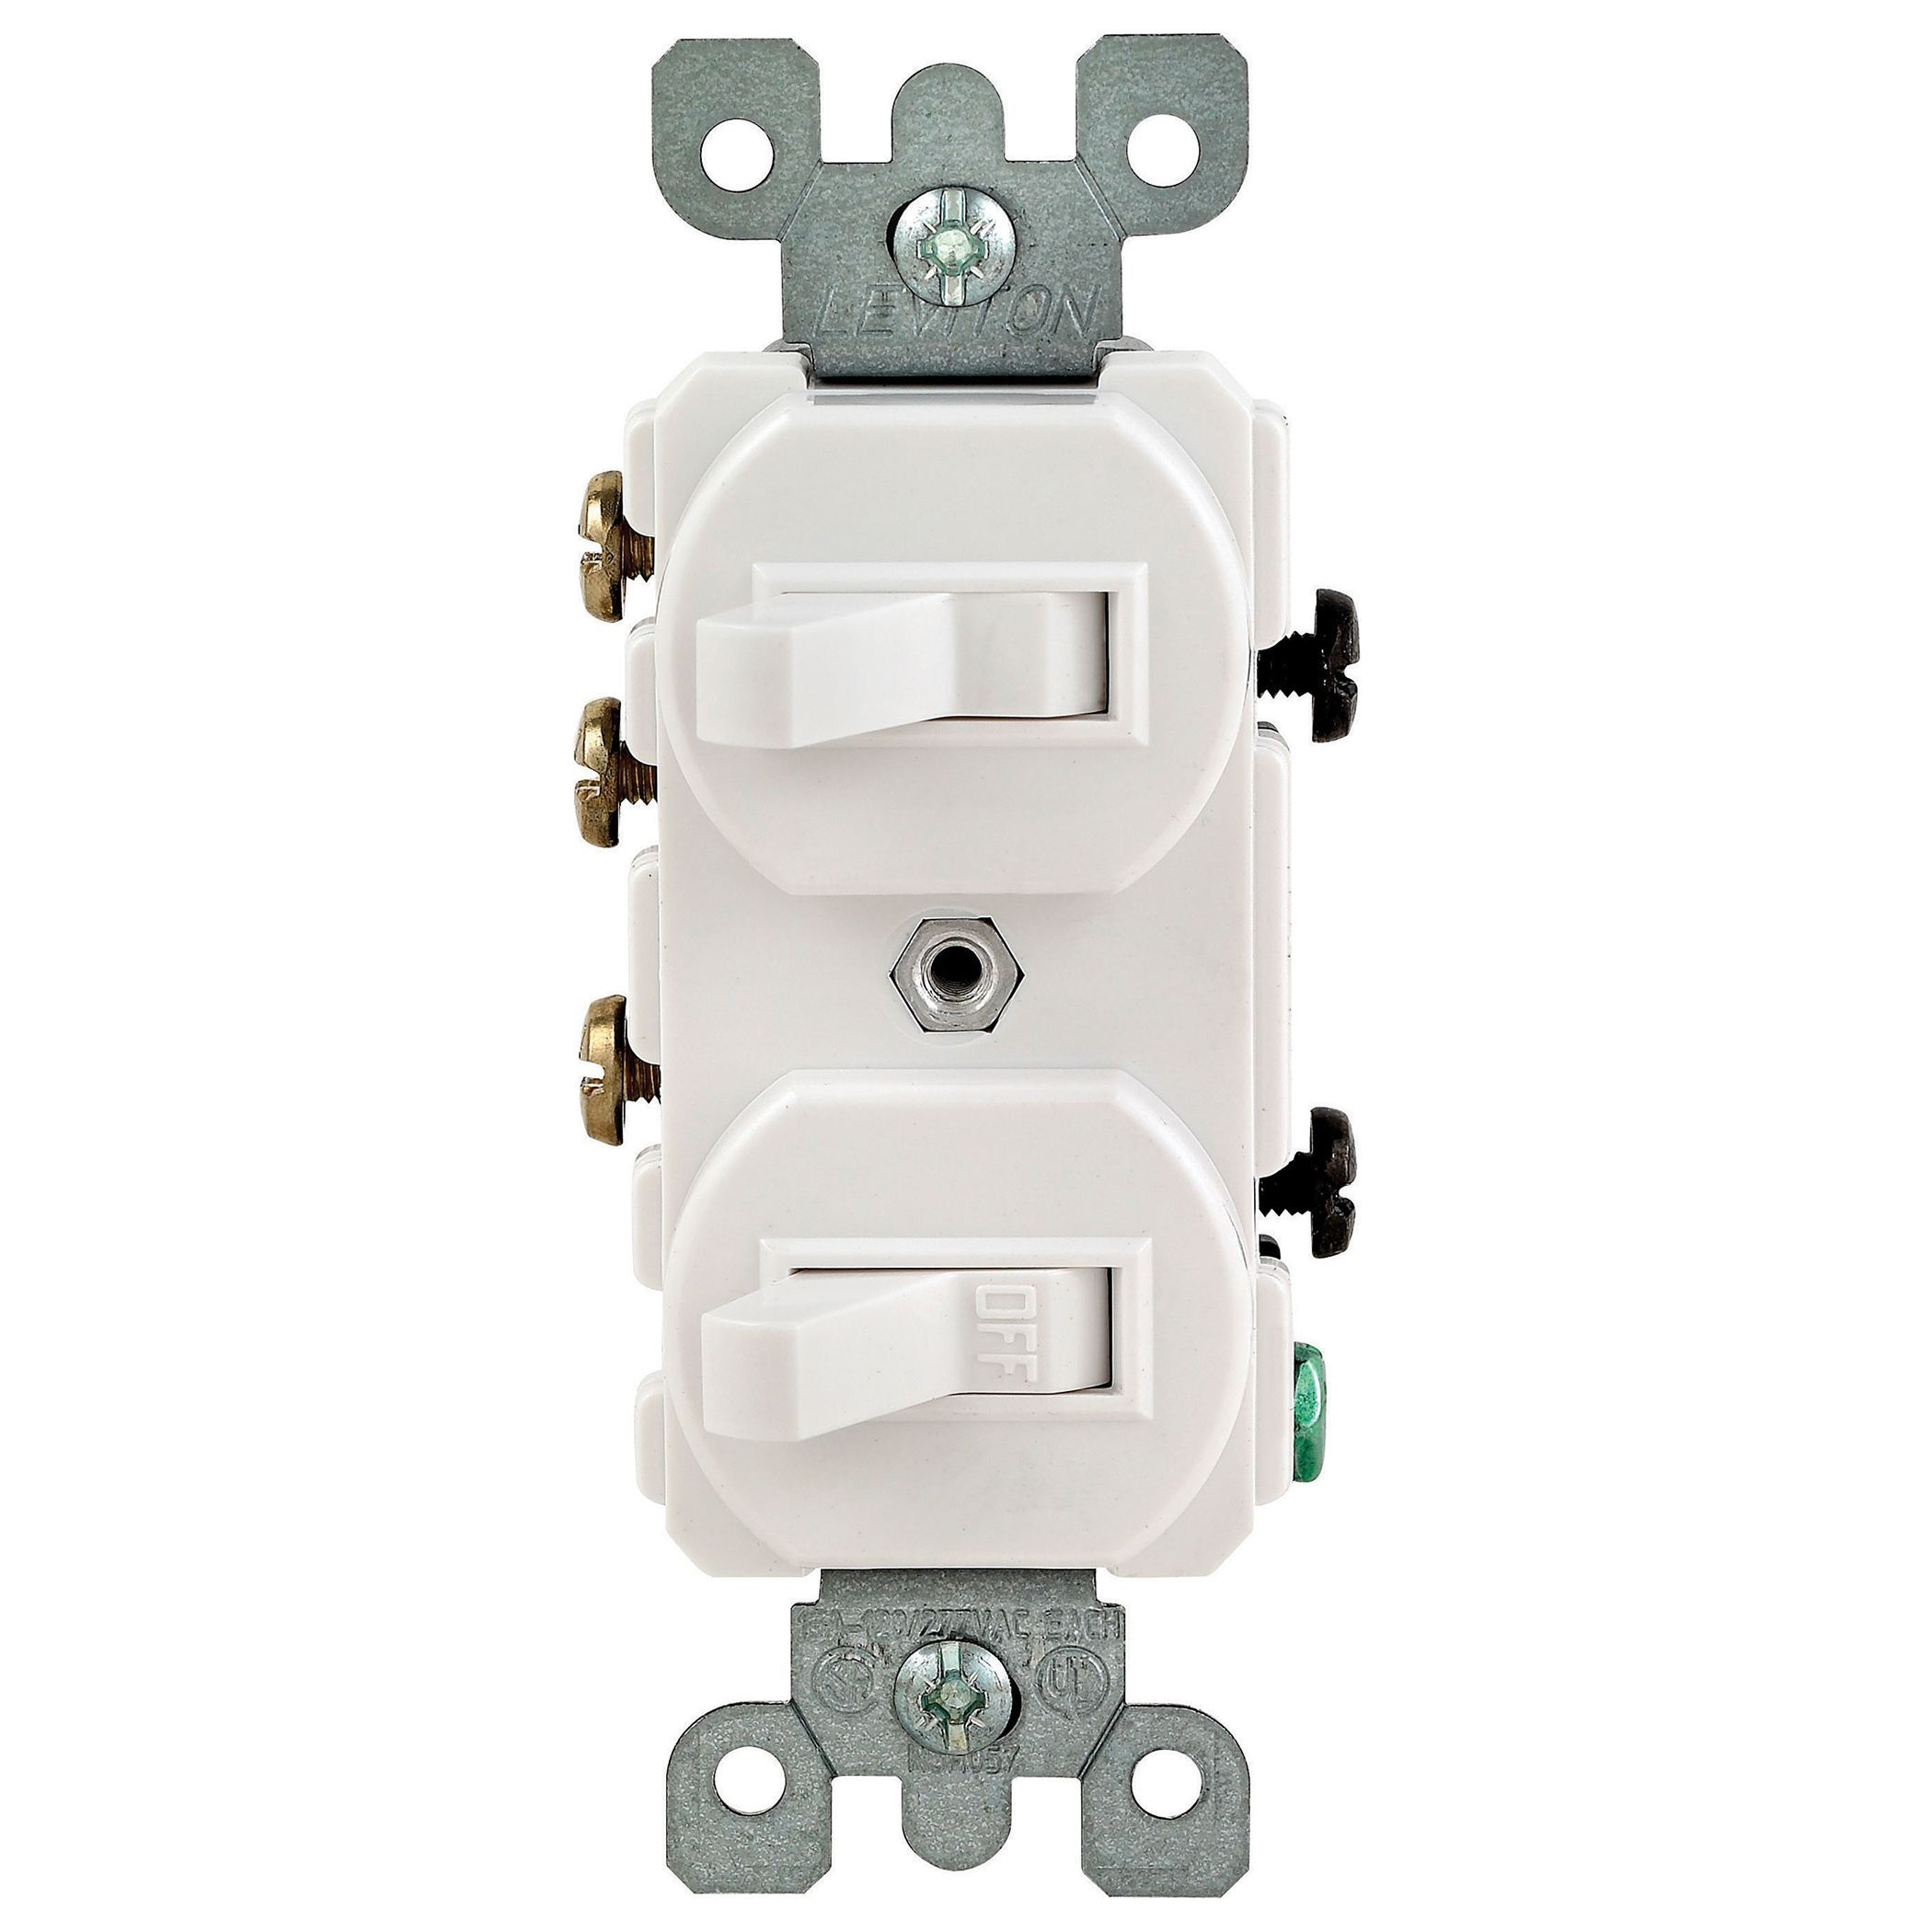 Leviton R62052410WS White Commercial Grade 3Way AC